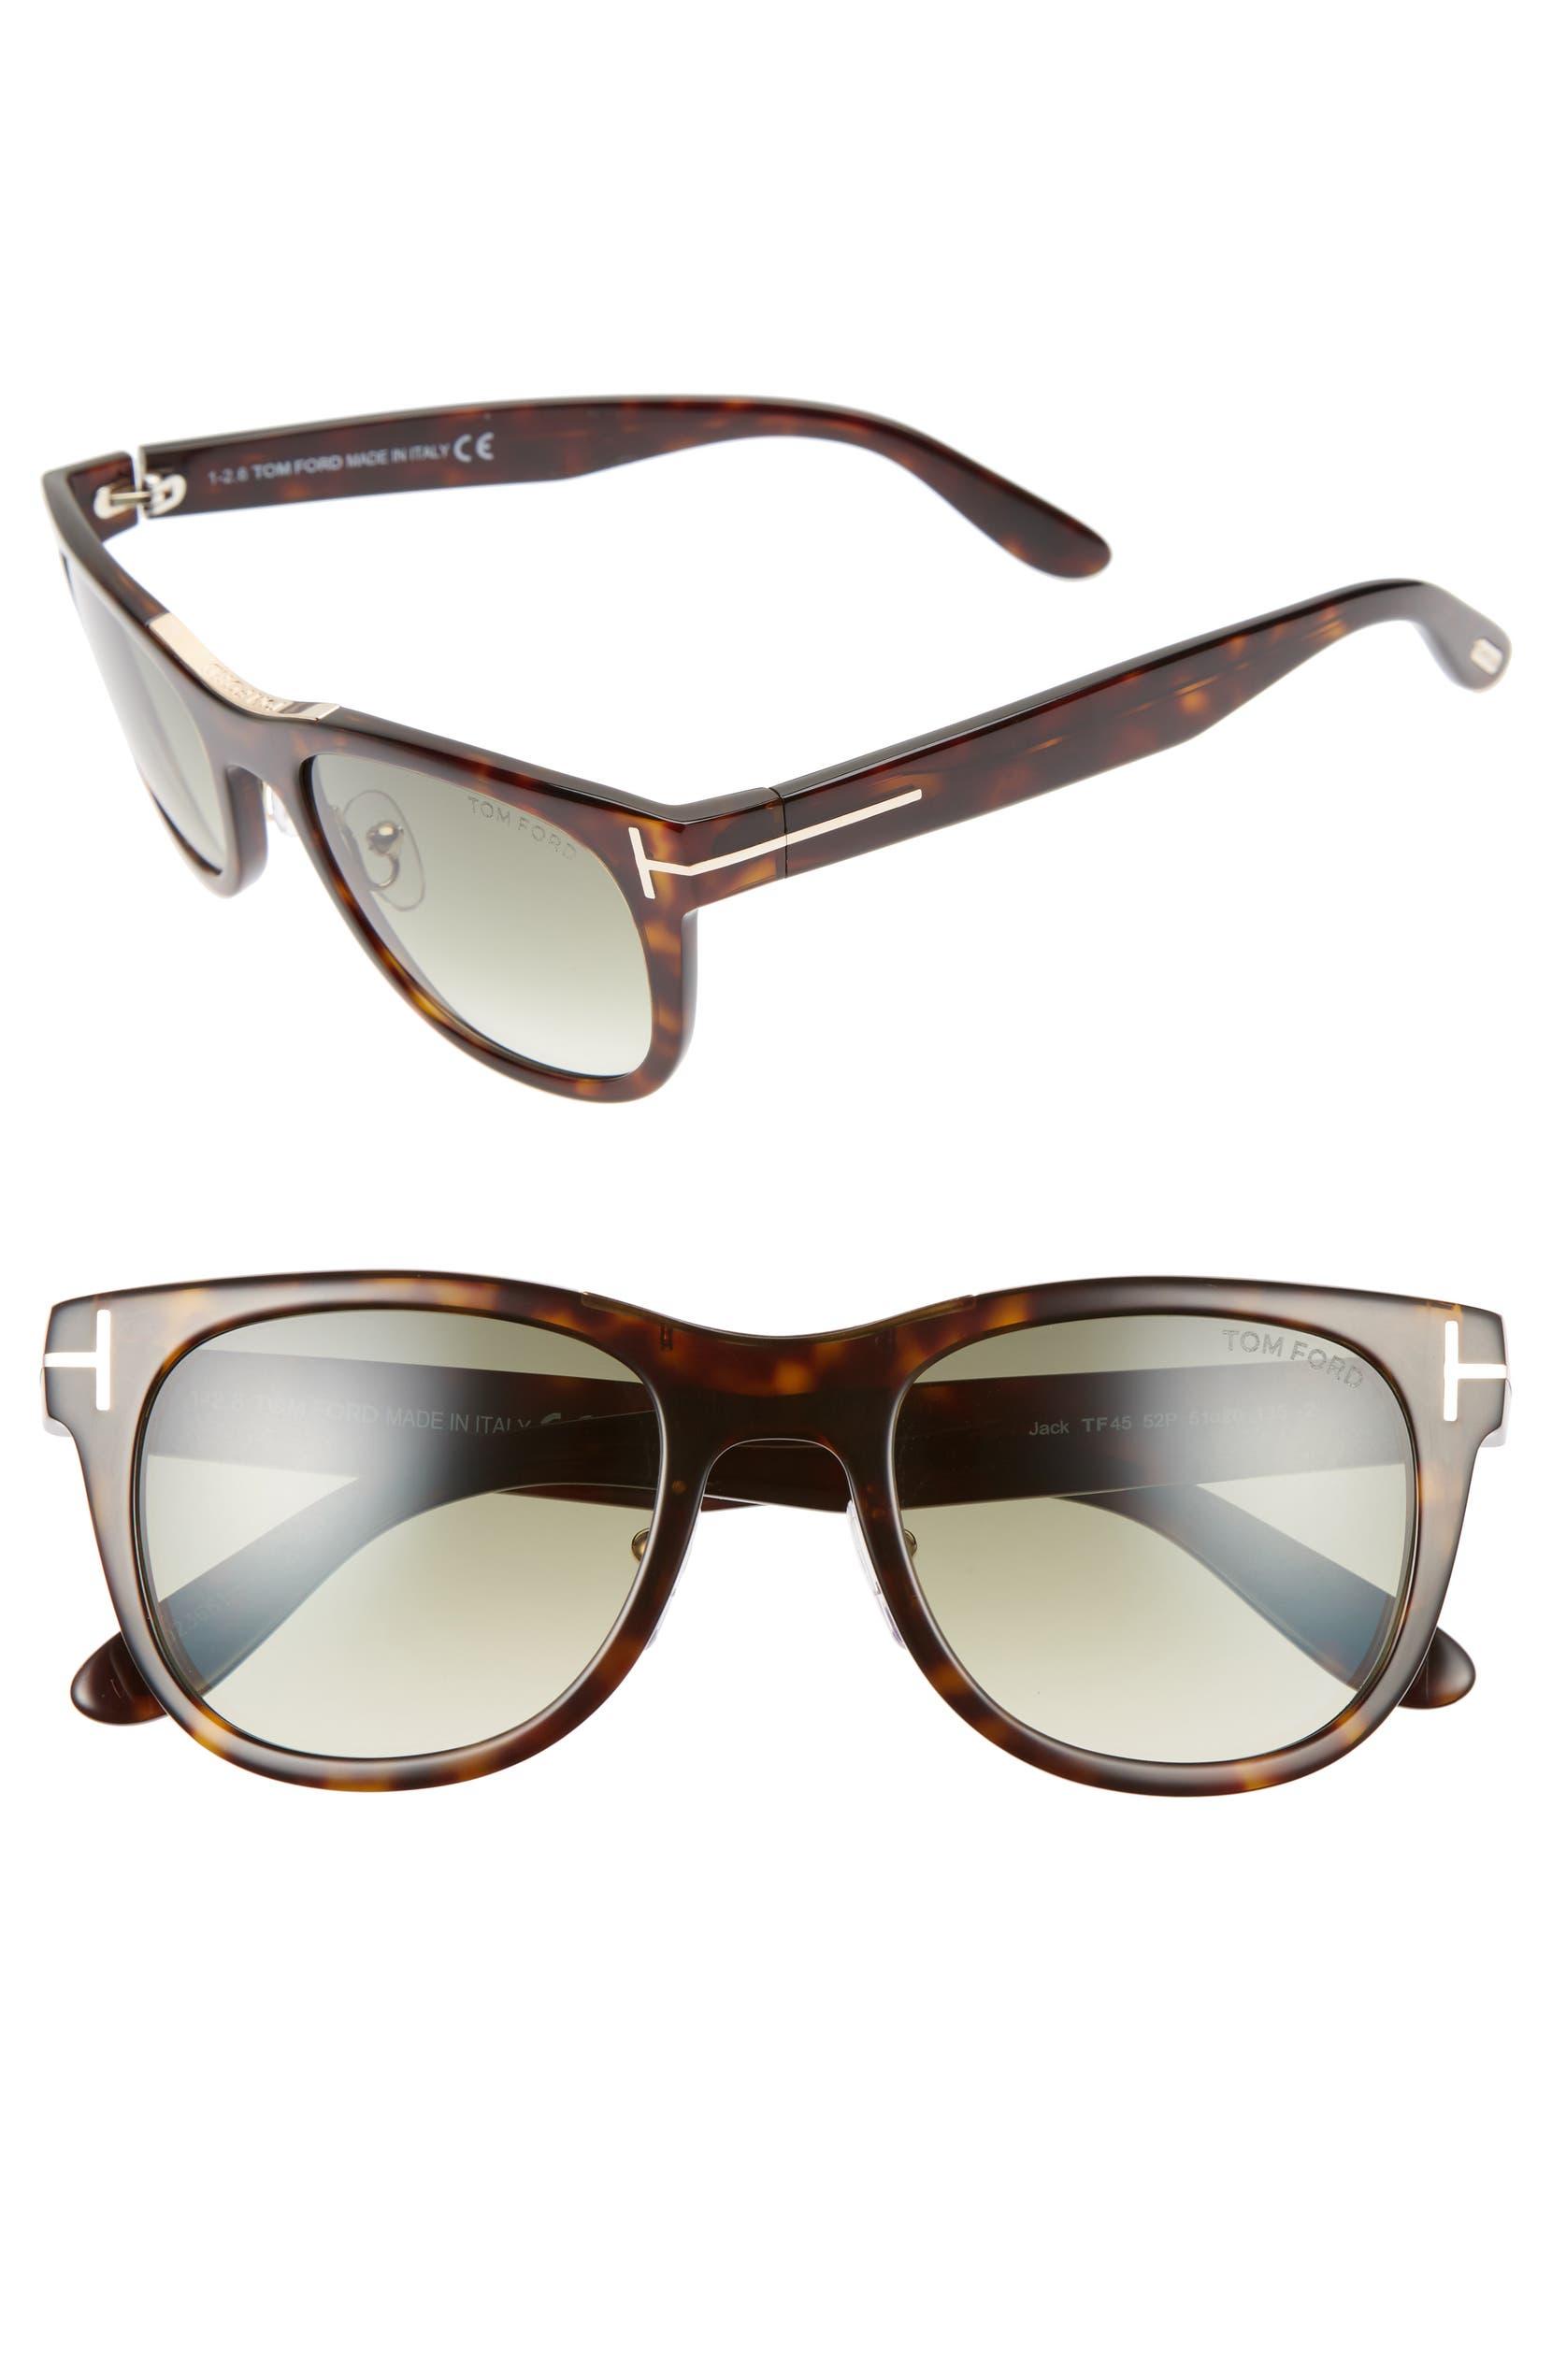 SunglassesNordstrom 51mm 51mm Jack Tom SunglassesNordstrom Tom Tom Ford Jack Ford Ford F3TJ1clK